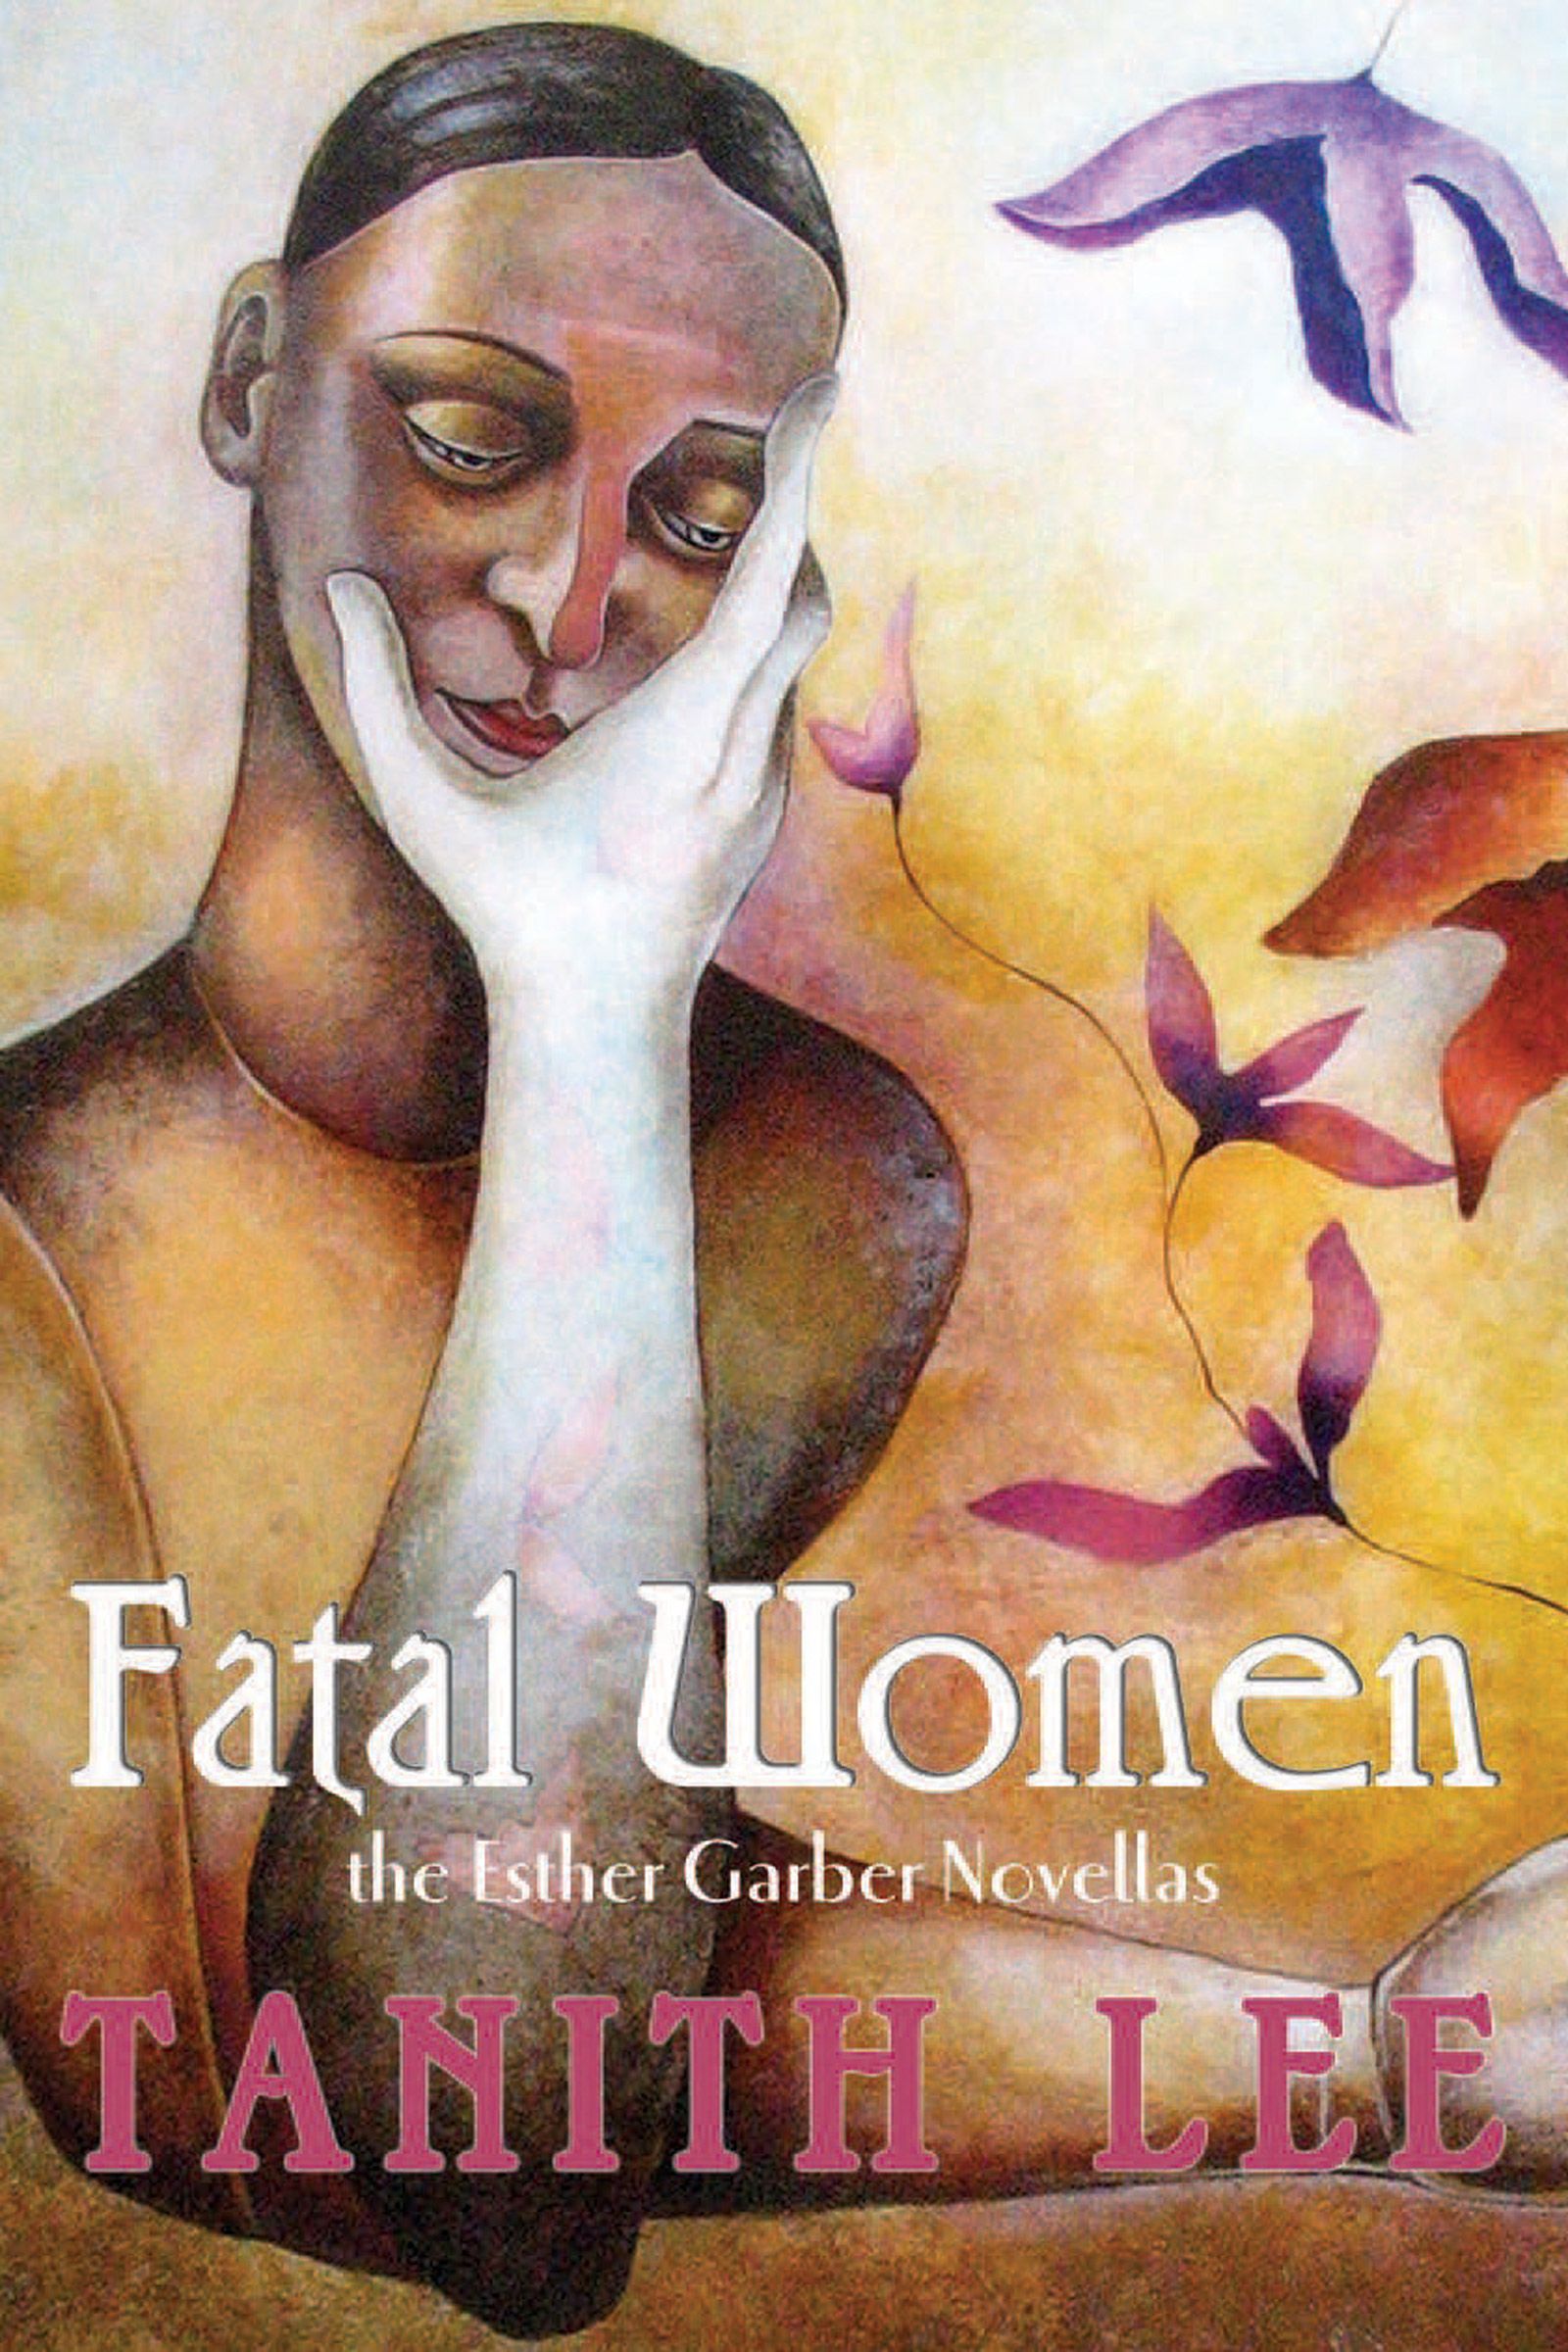 Lee, Tanith - Fatal Women: The Esther Garber Novellas